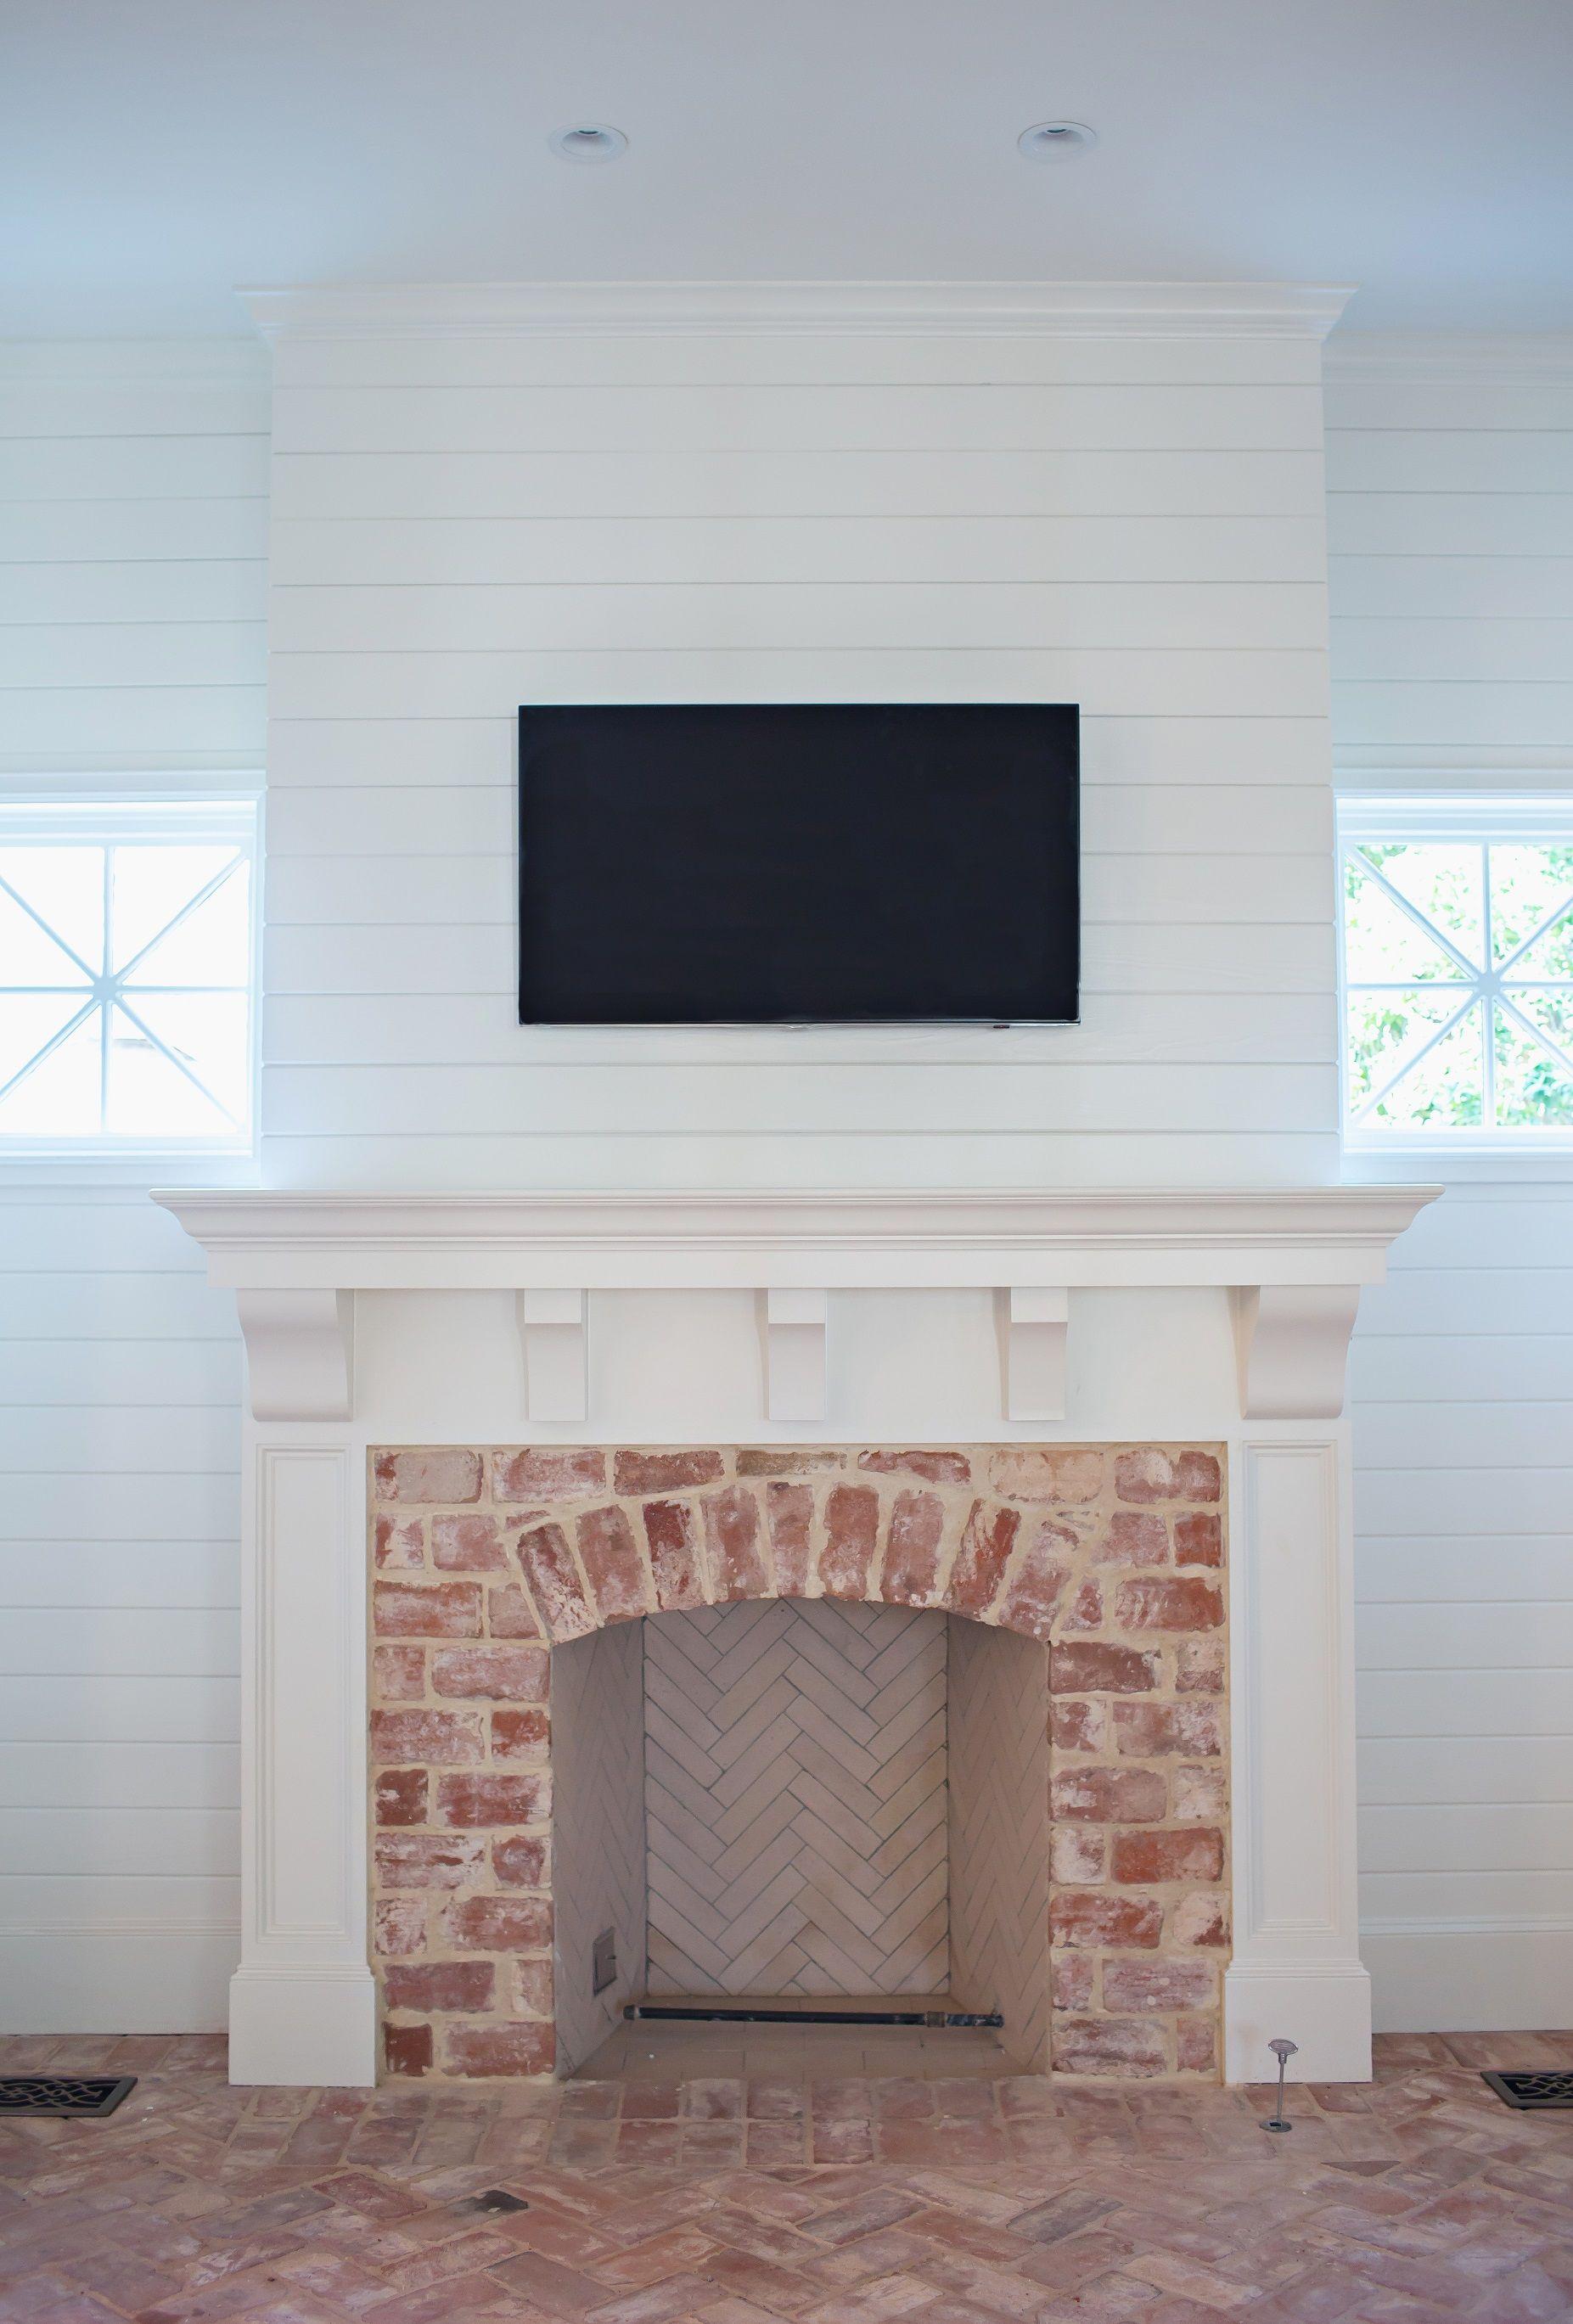 Pin von Coats Homes auf Completed | 3224 Greenbrier | Pinterest ...